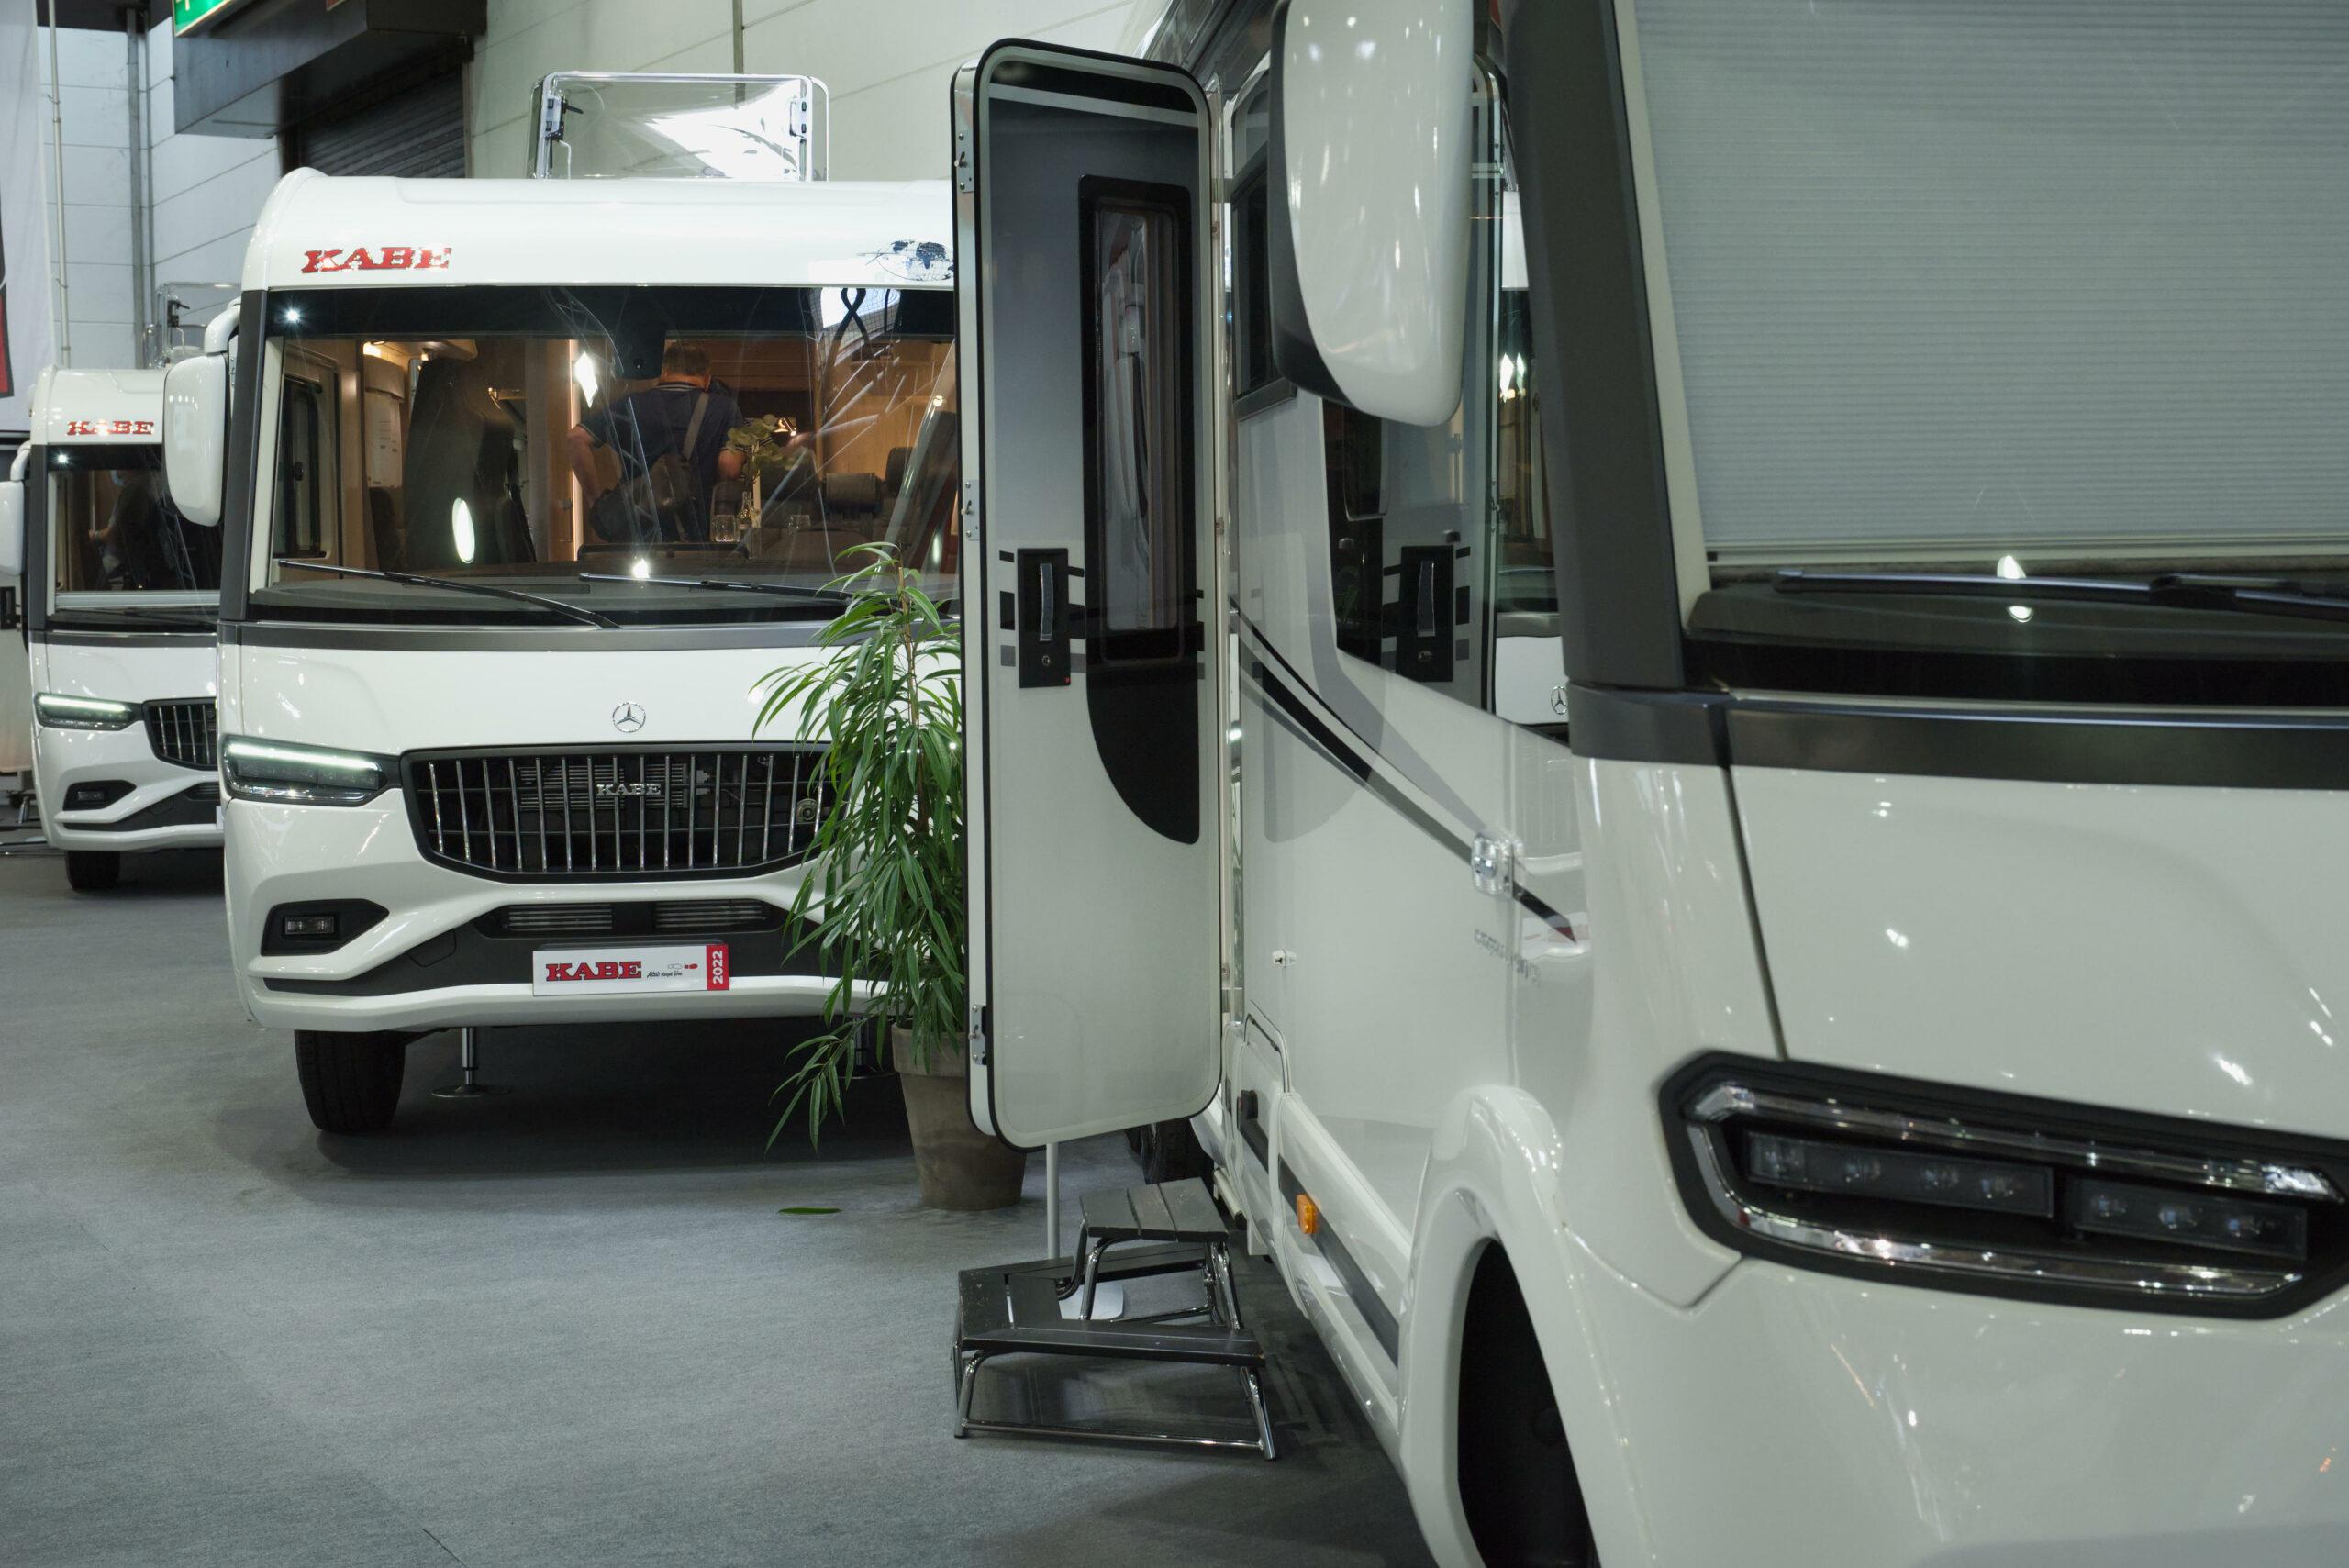 Kabe Wohnmobile auf dem Caravan Salon